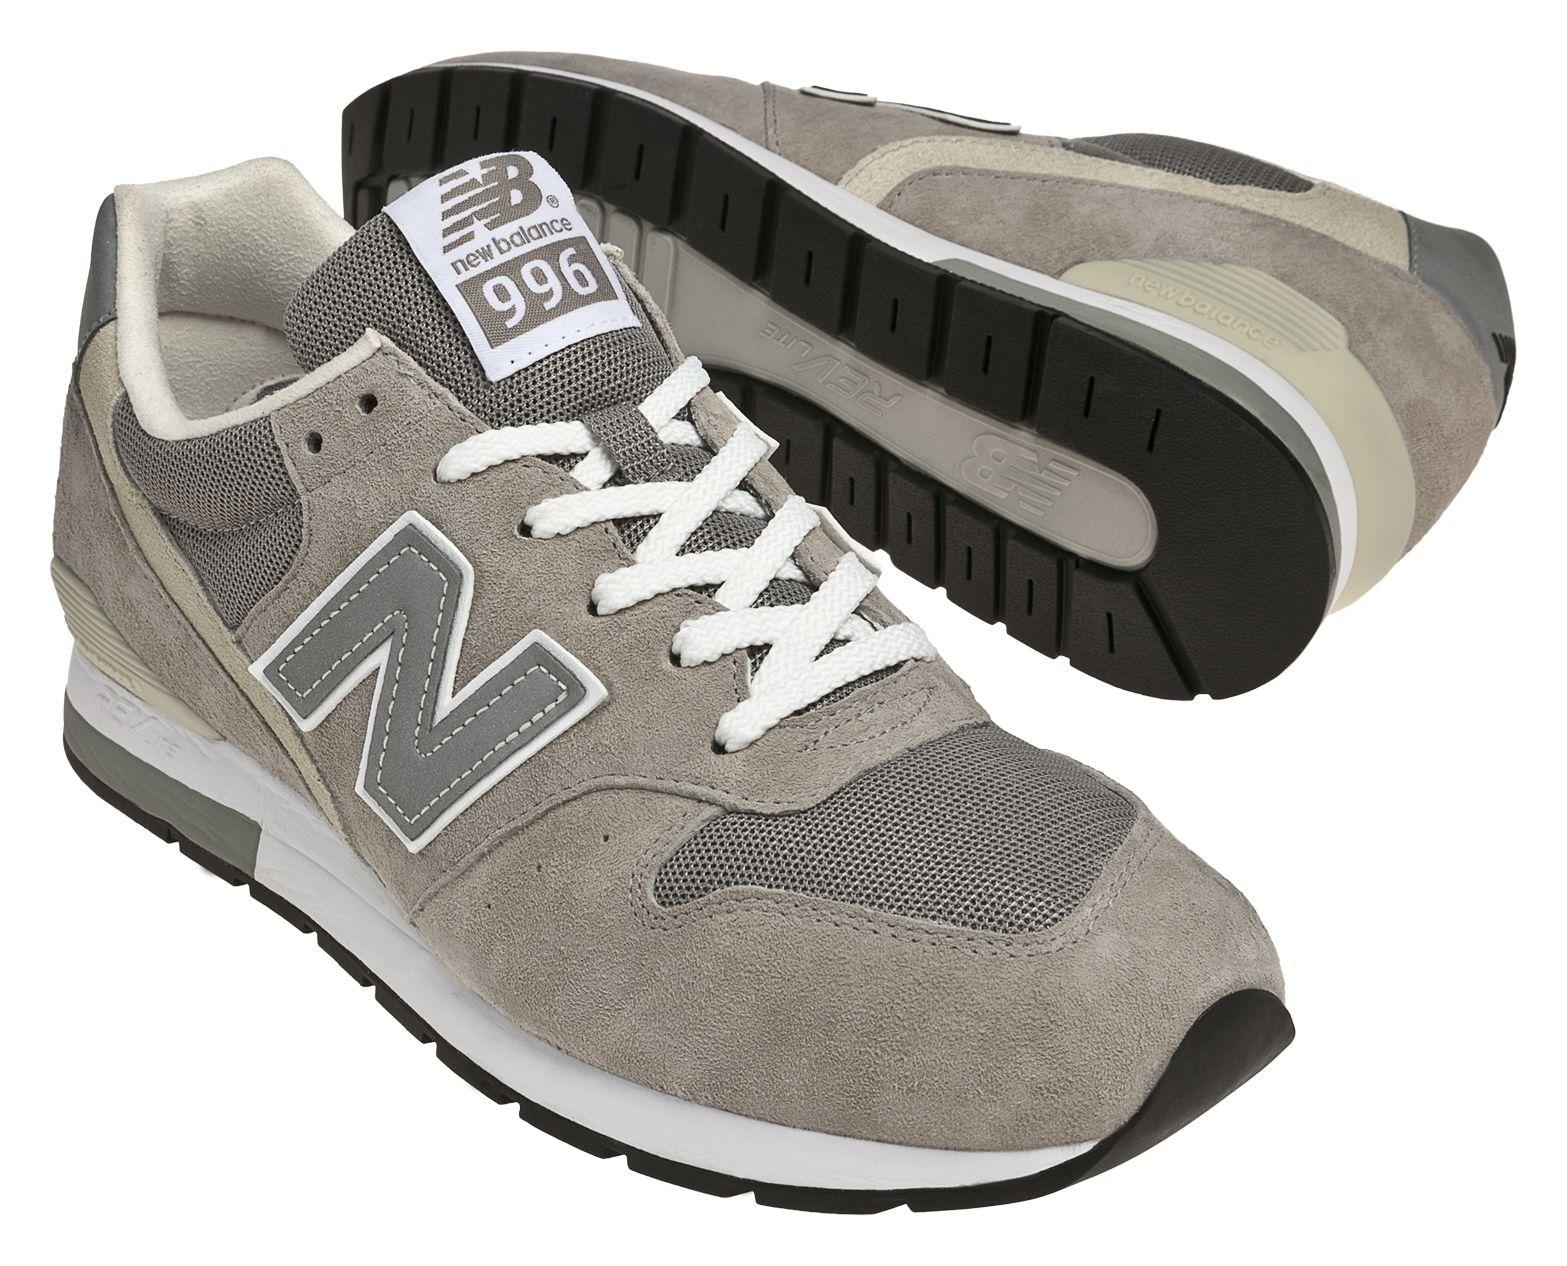 NB Revlite 996, Grey with Heather Grey \u0026 Cream